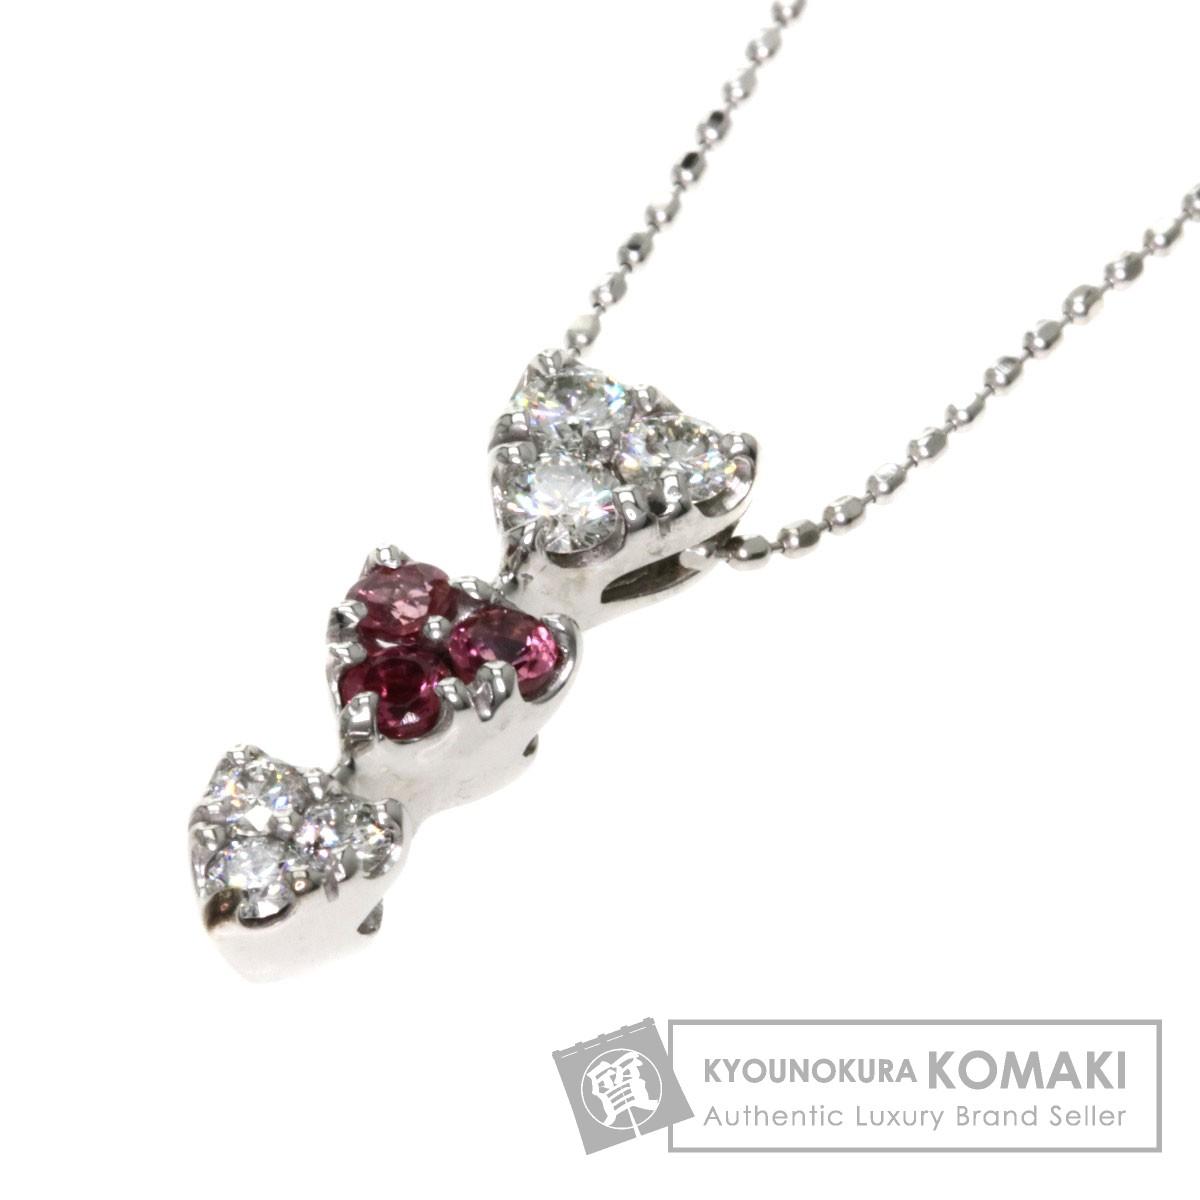 T トルマリン/ダイヤモンド/ハート ネックレス K10WG 2.9g レディース 【中古】